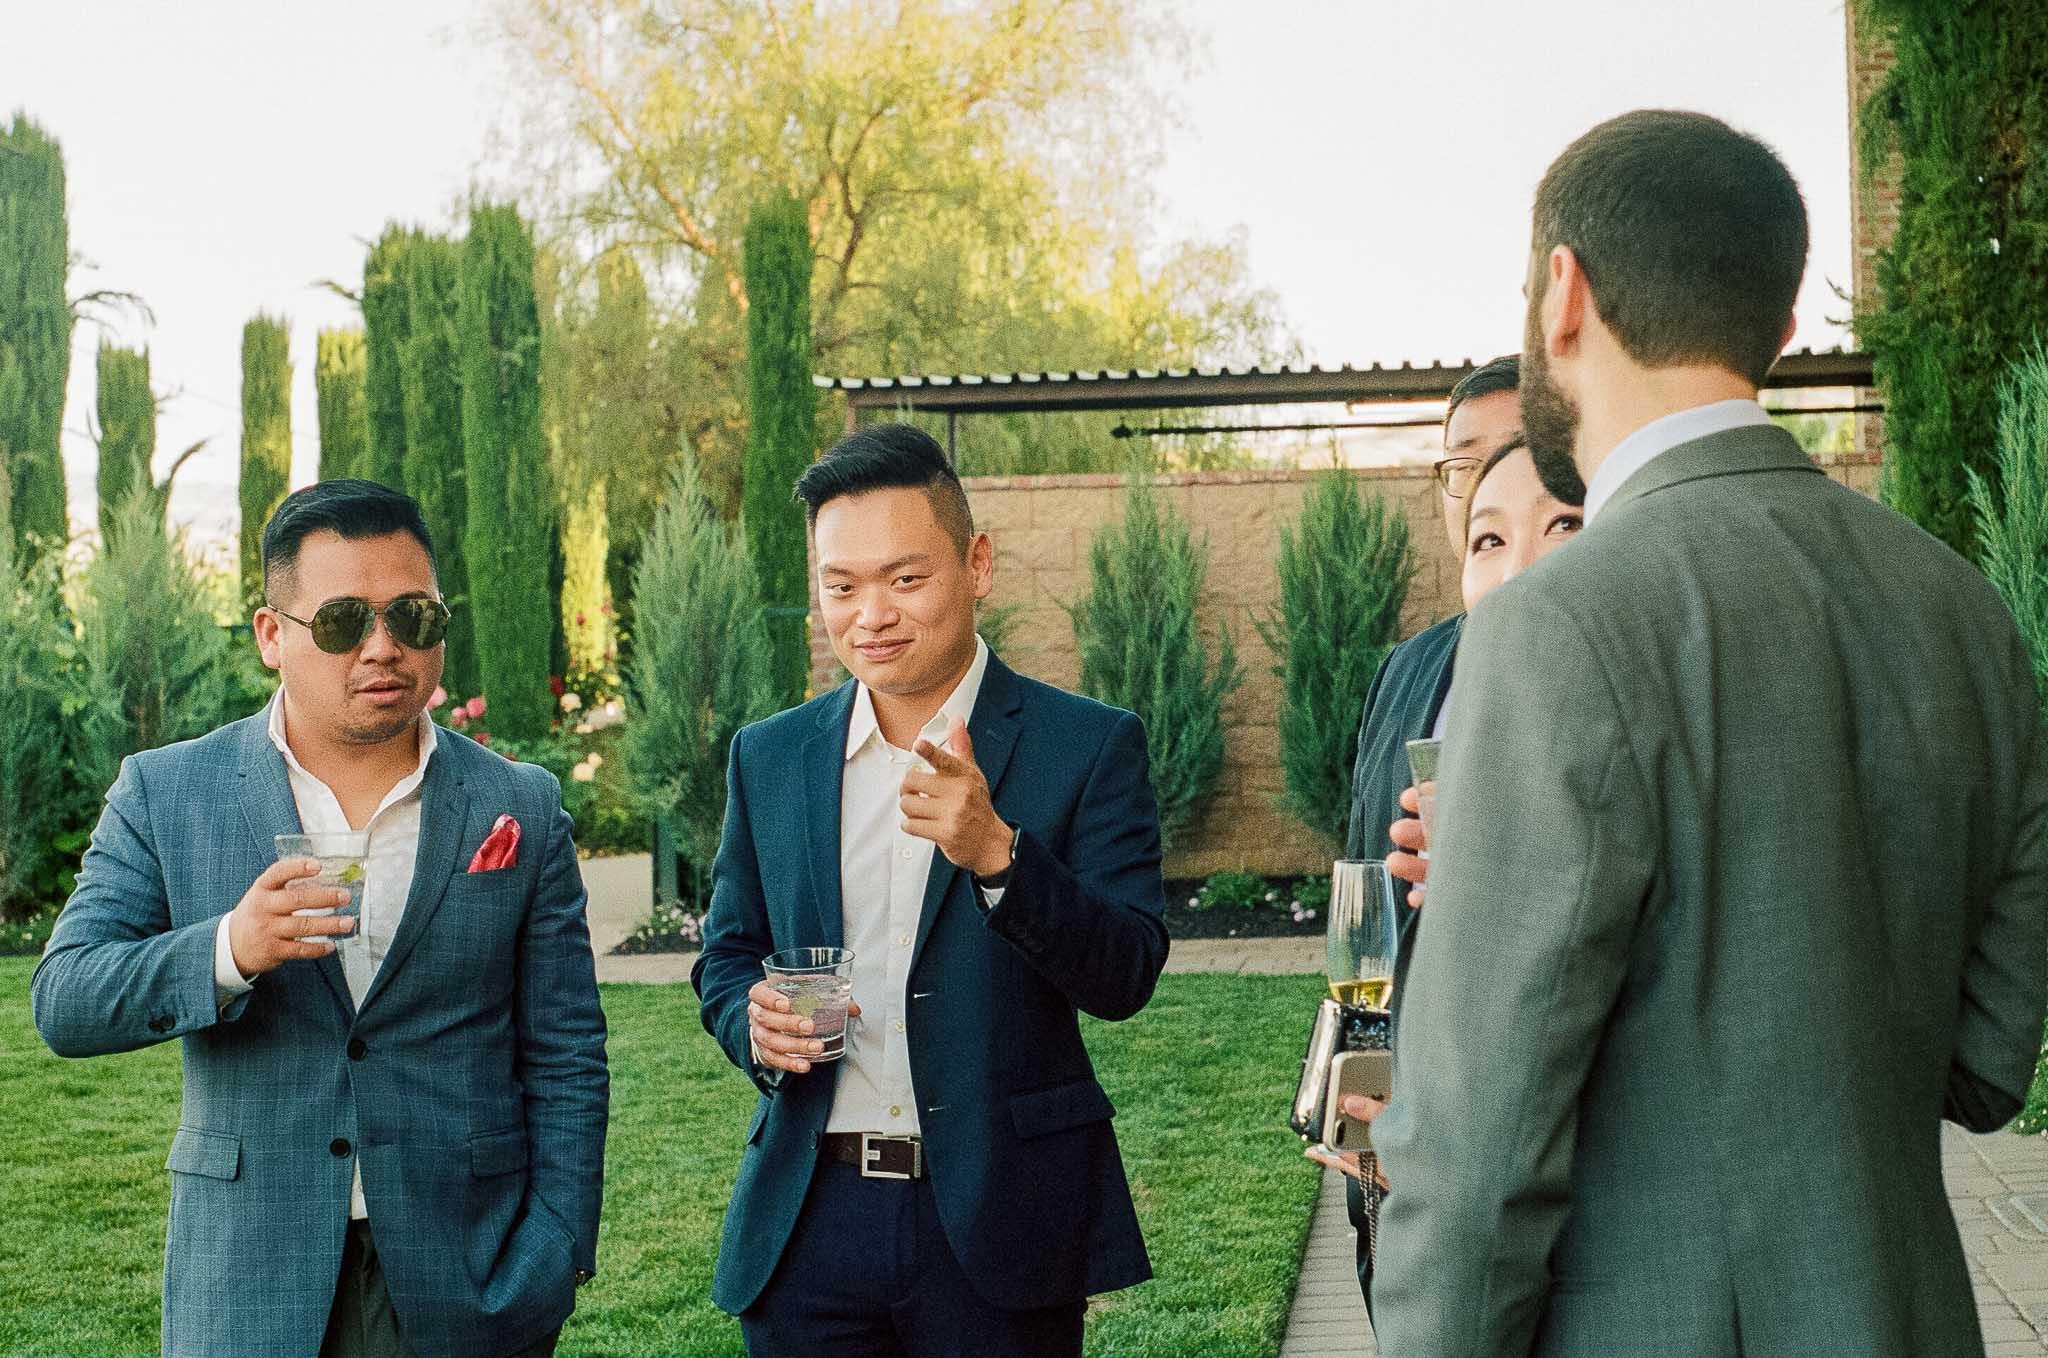 Wedding-Guest-Pointing.jpg